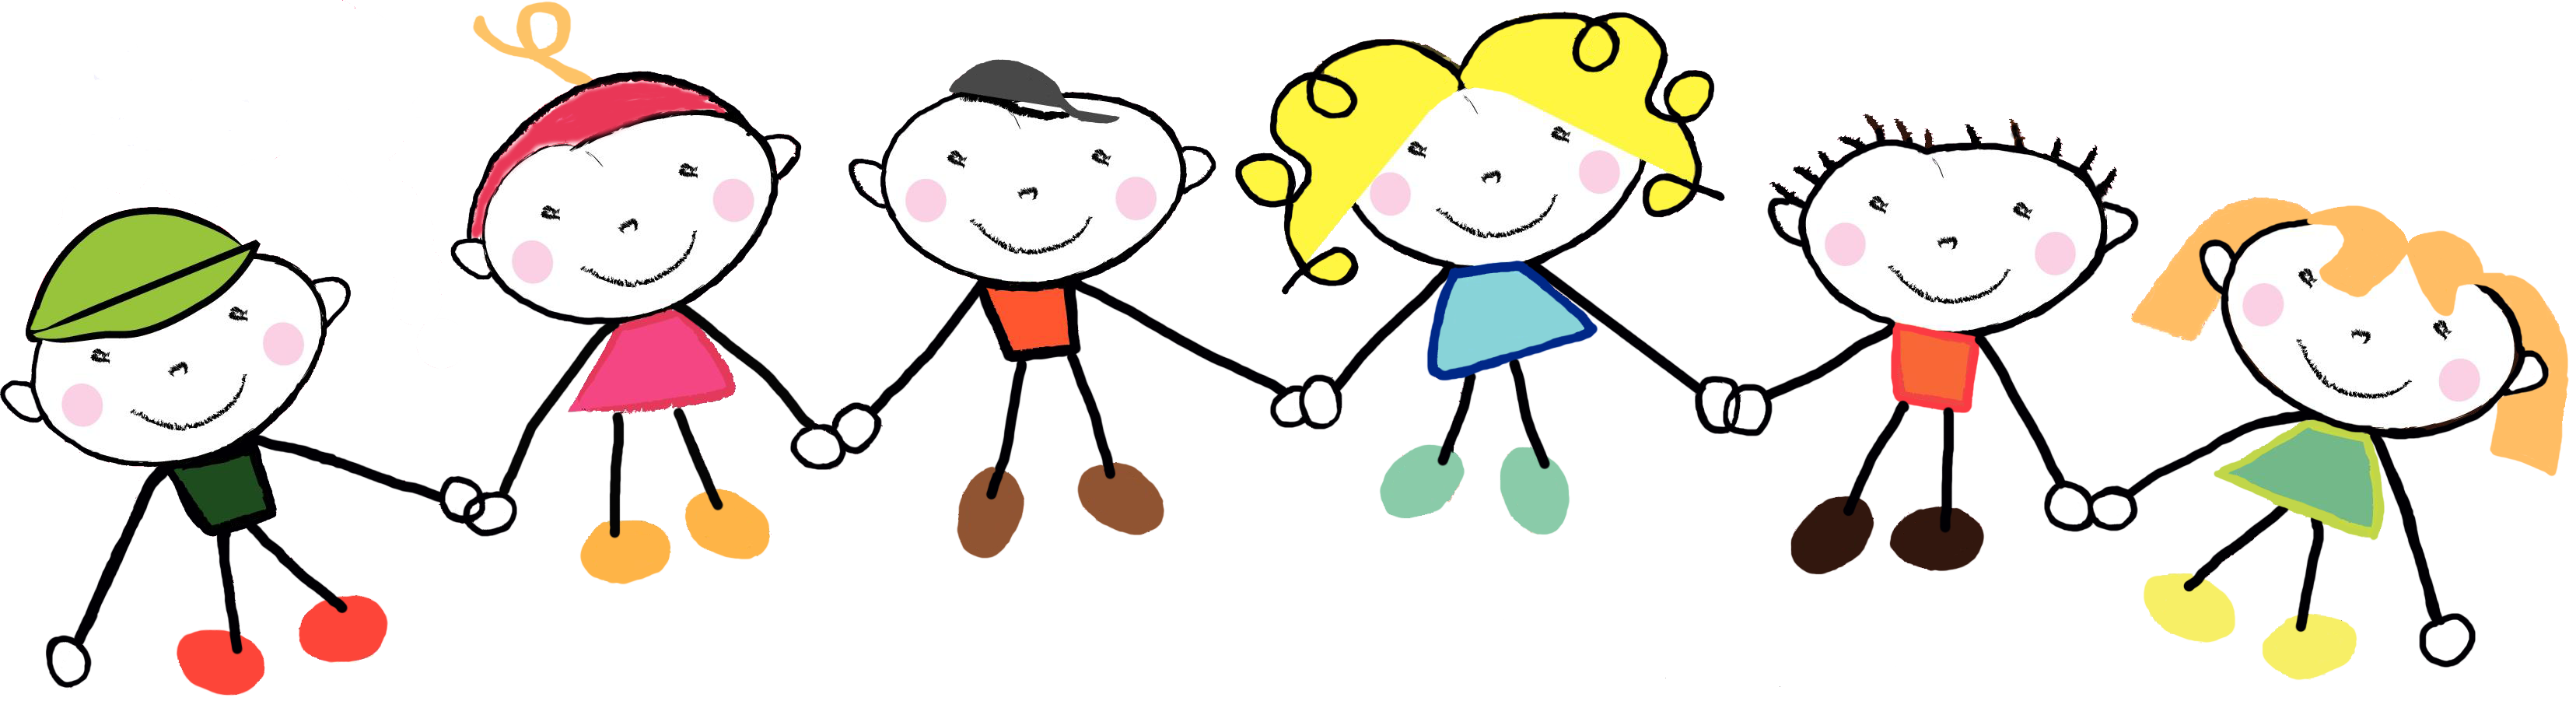 kids.png (3312×928)